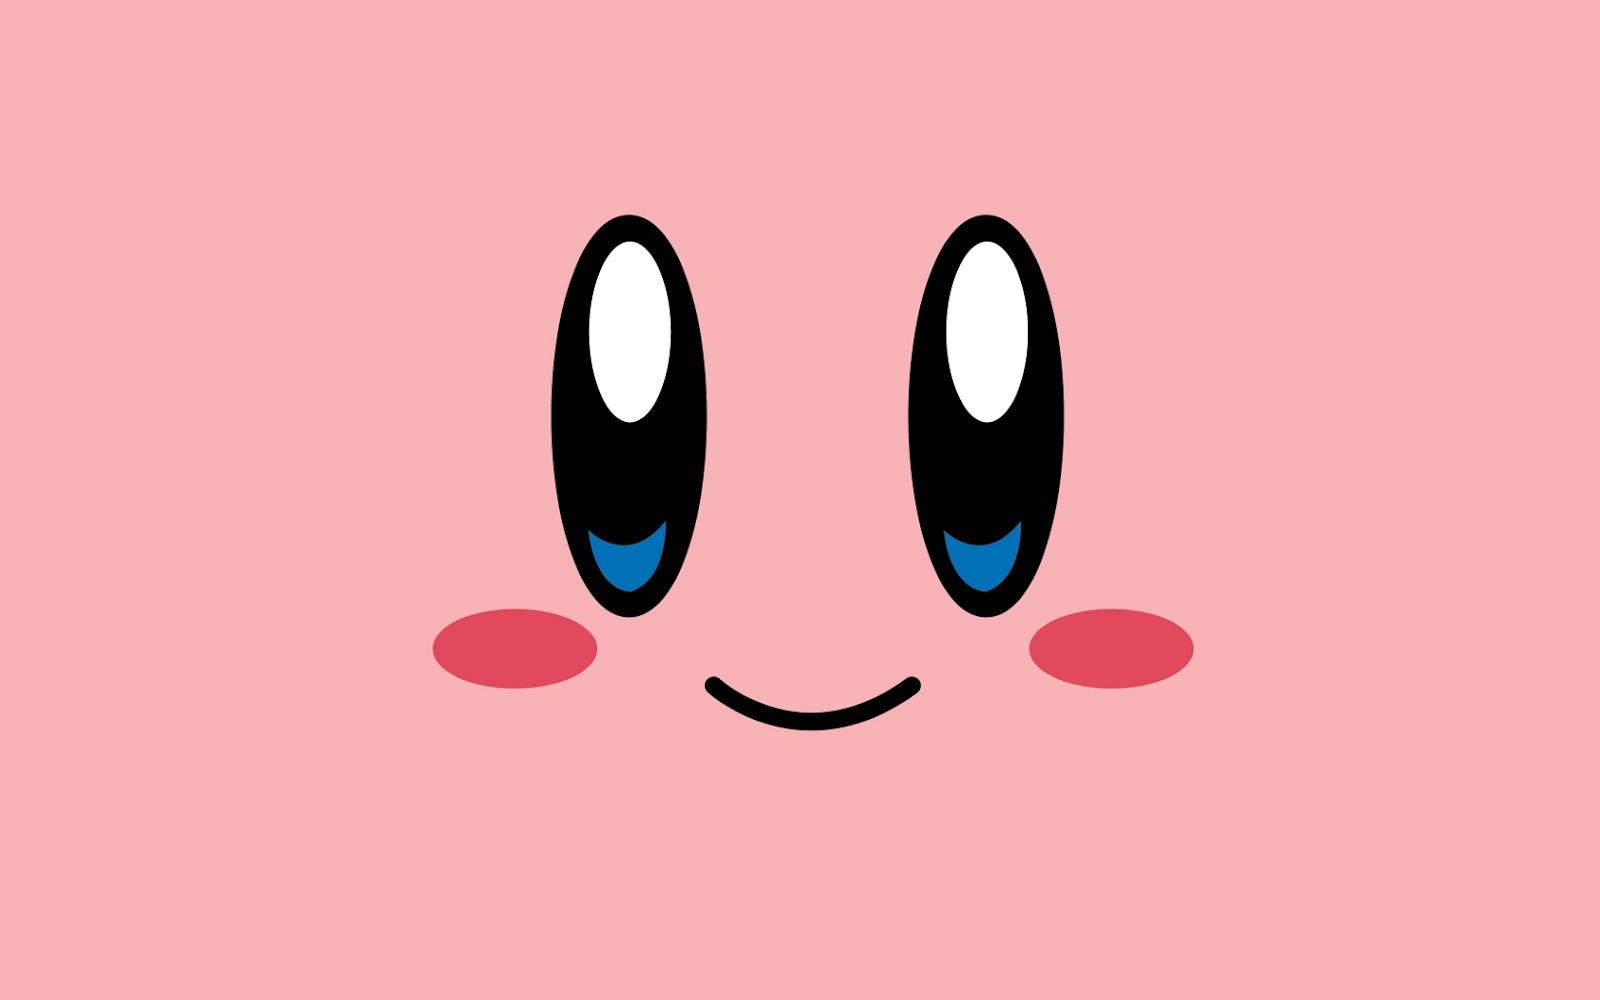 Kirby Hal Laboratory Nintendo Platform Game Face Wallpaper